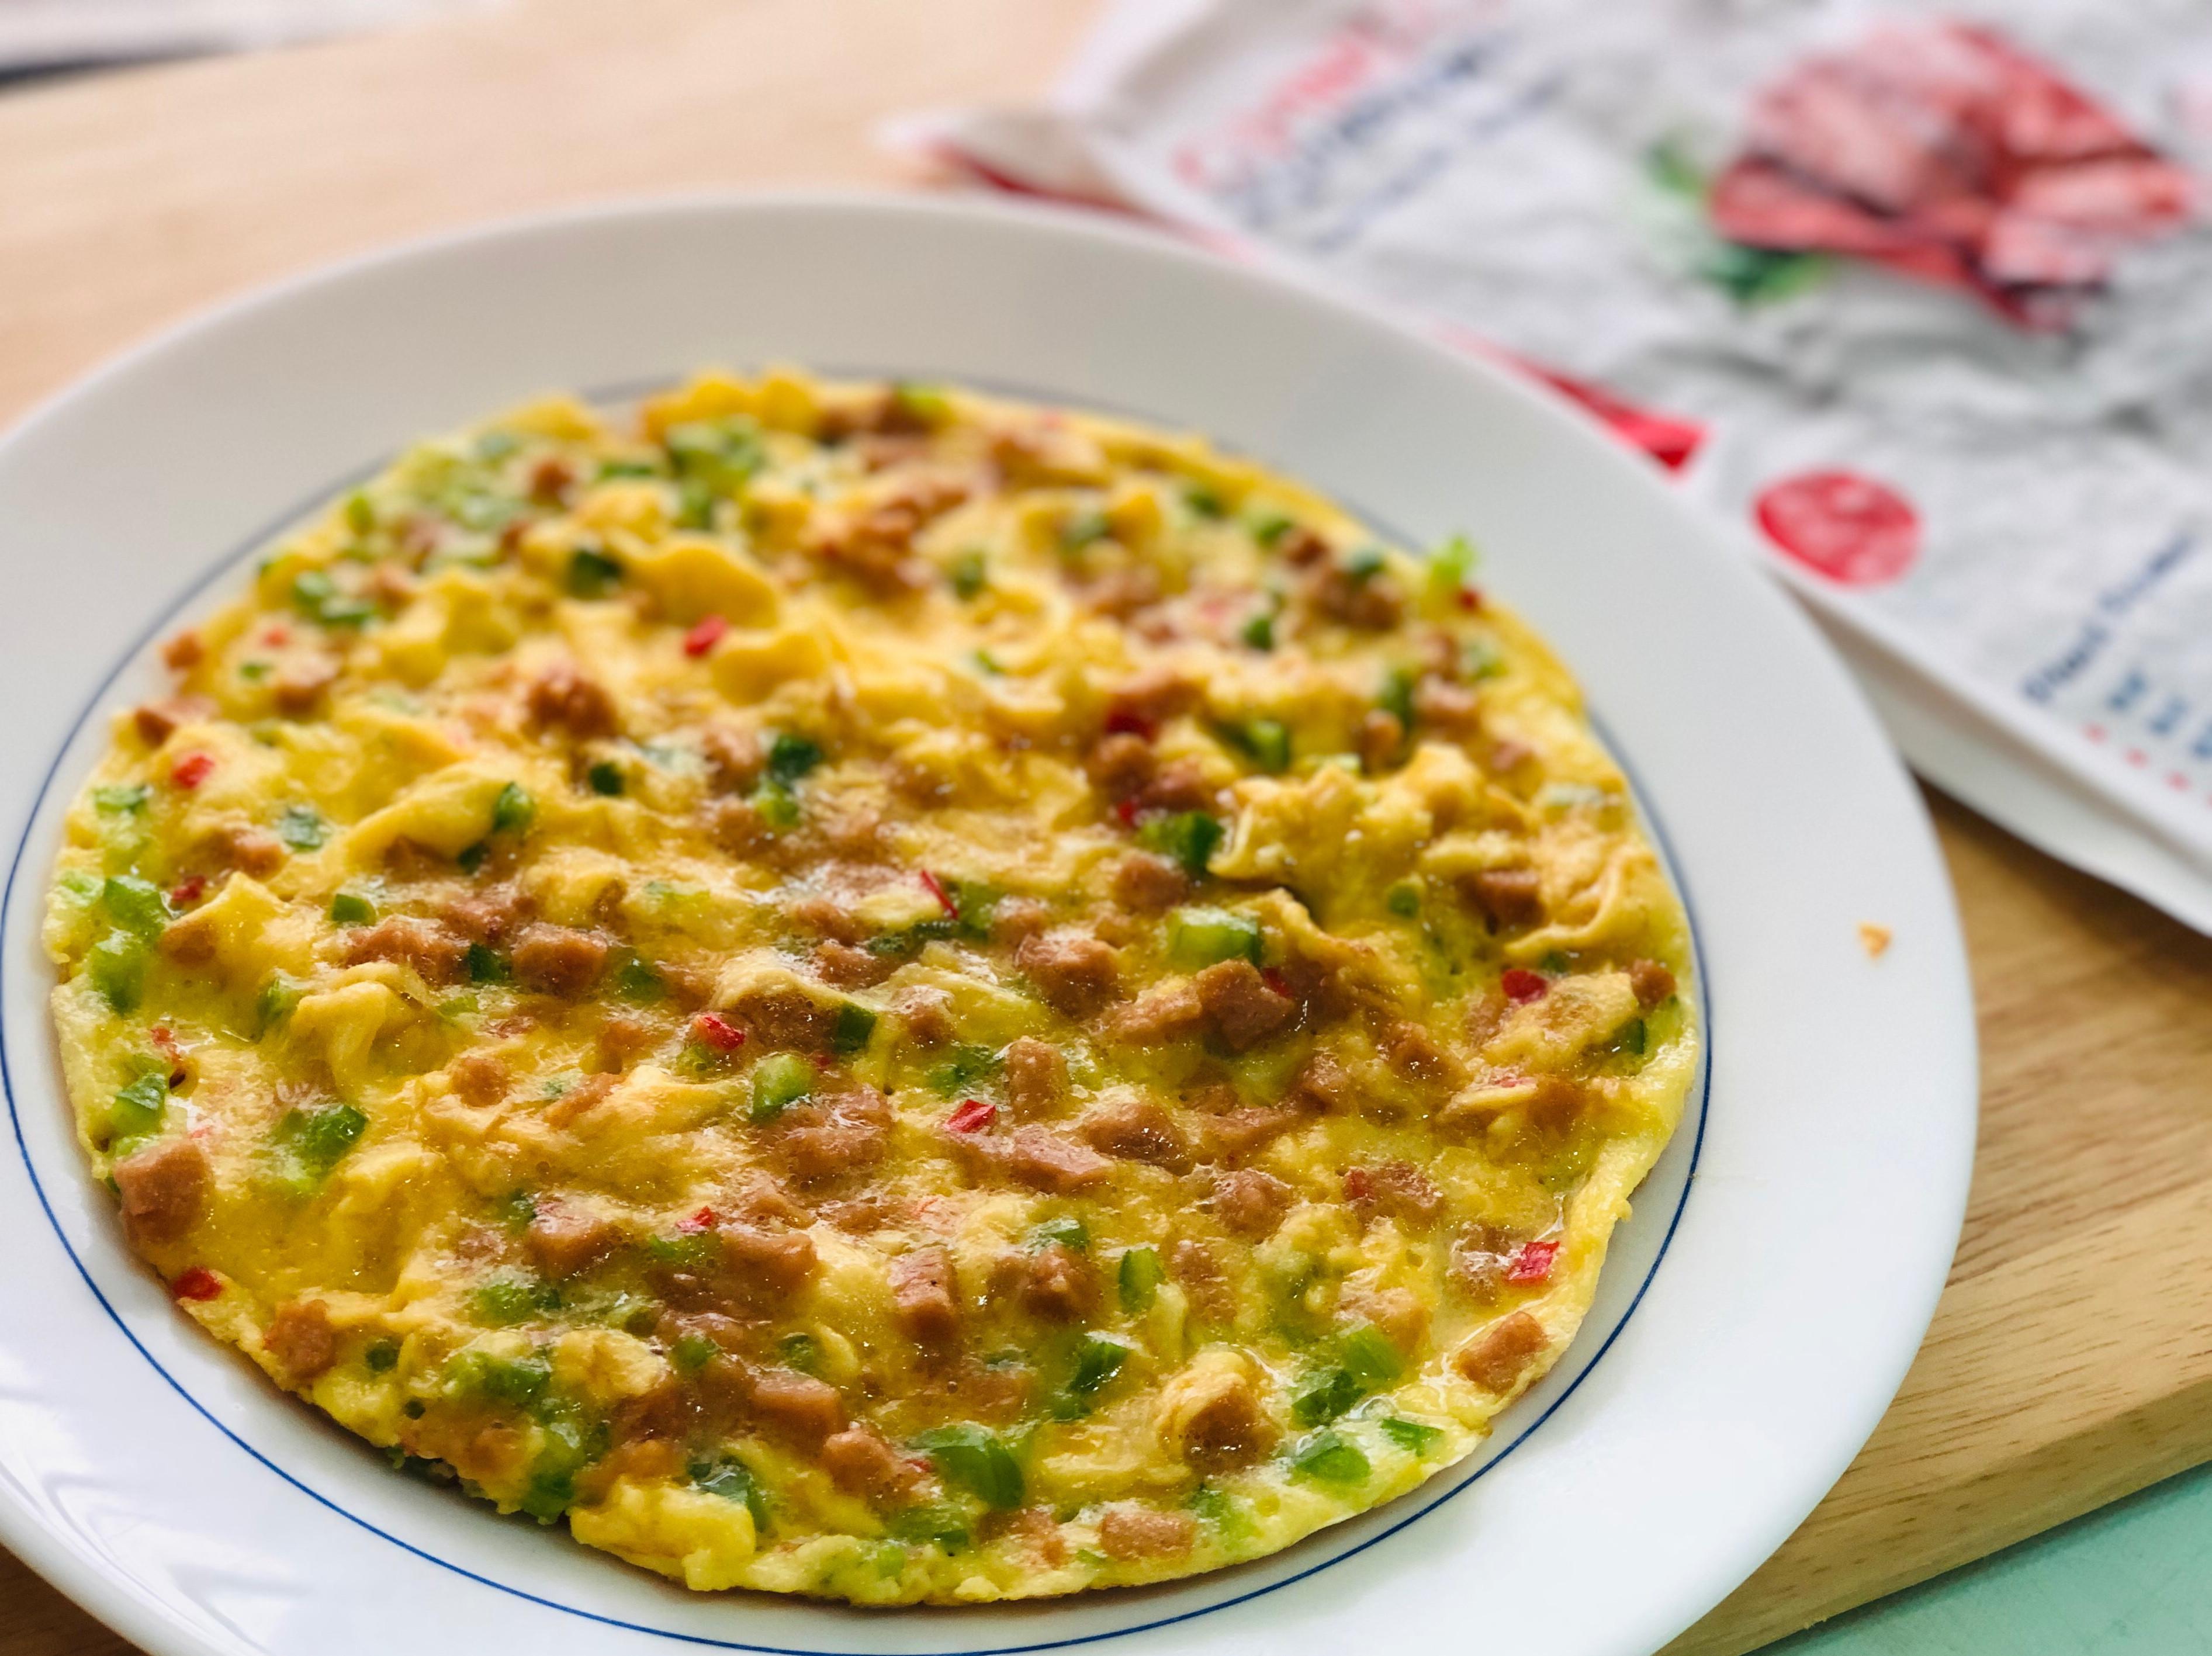 餐肉彩色烘蛋/OmniPork新餐肉